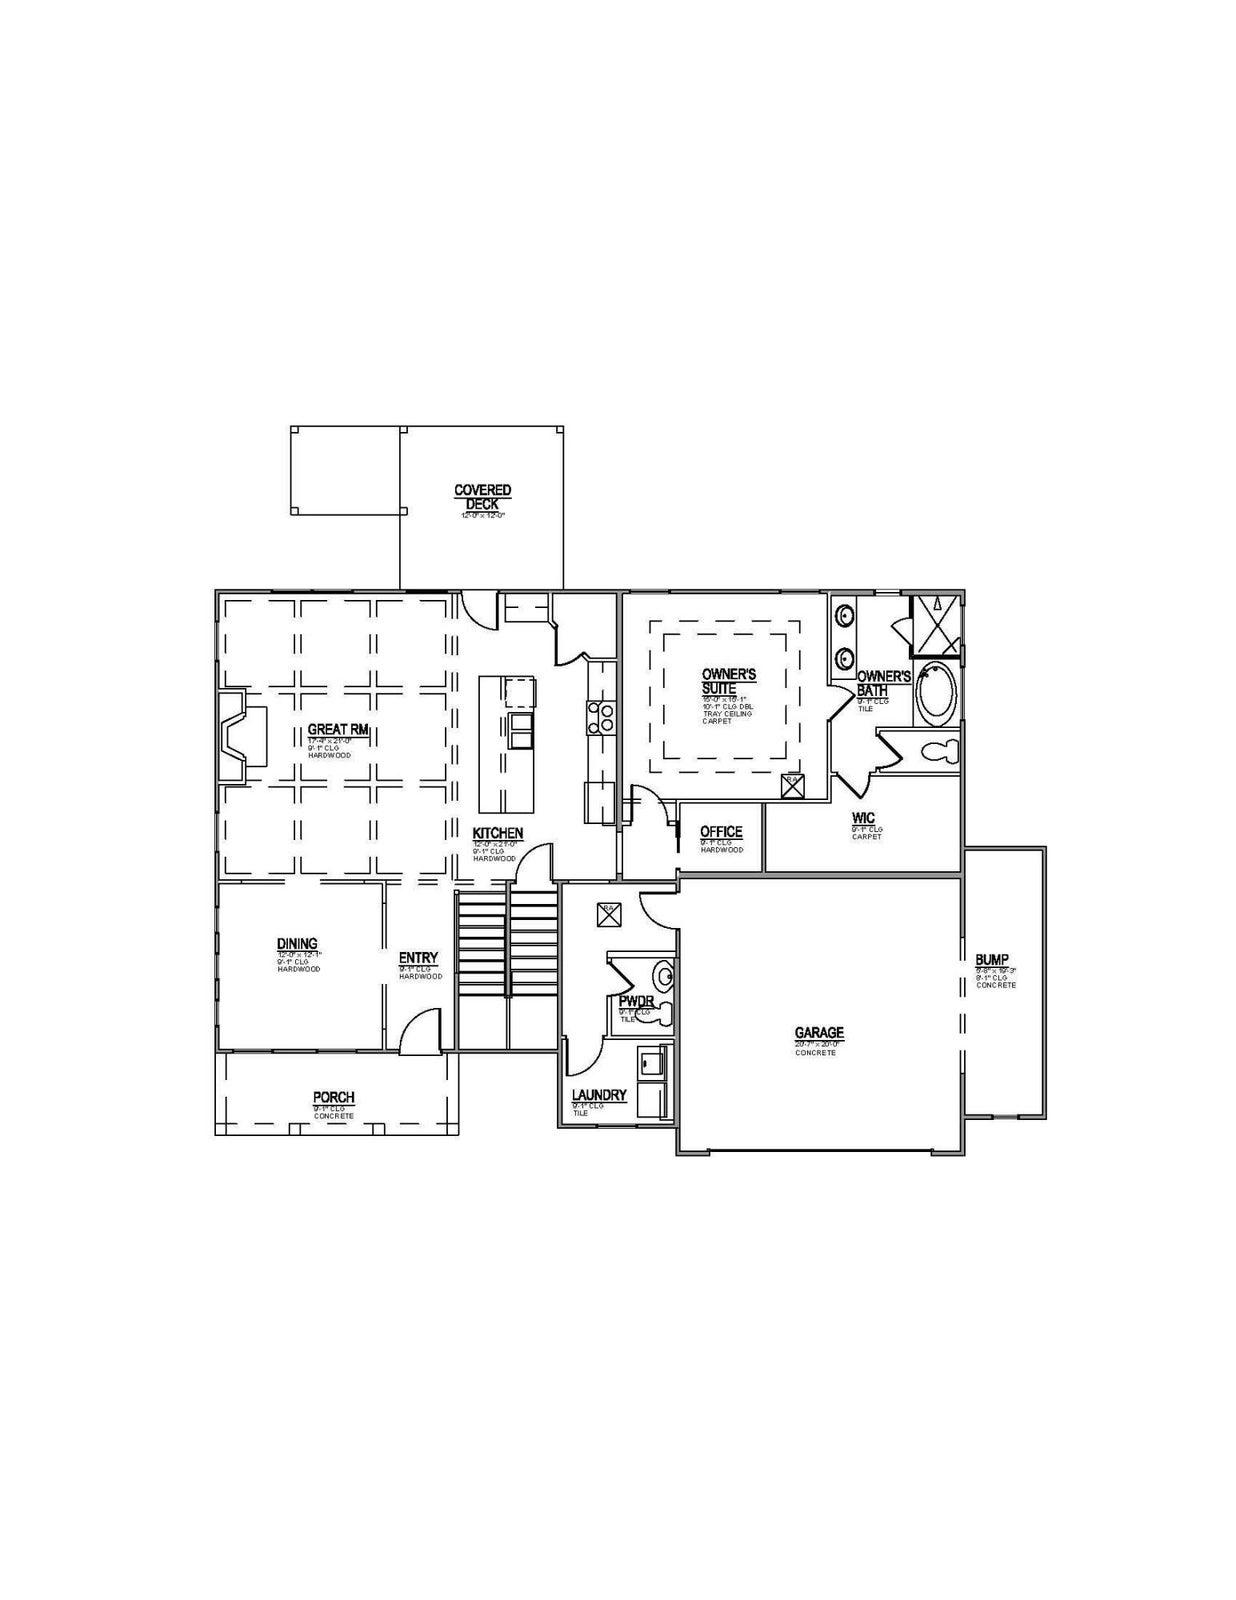 HHALL46 - MARKUP-1ST FLOOR